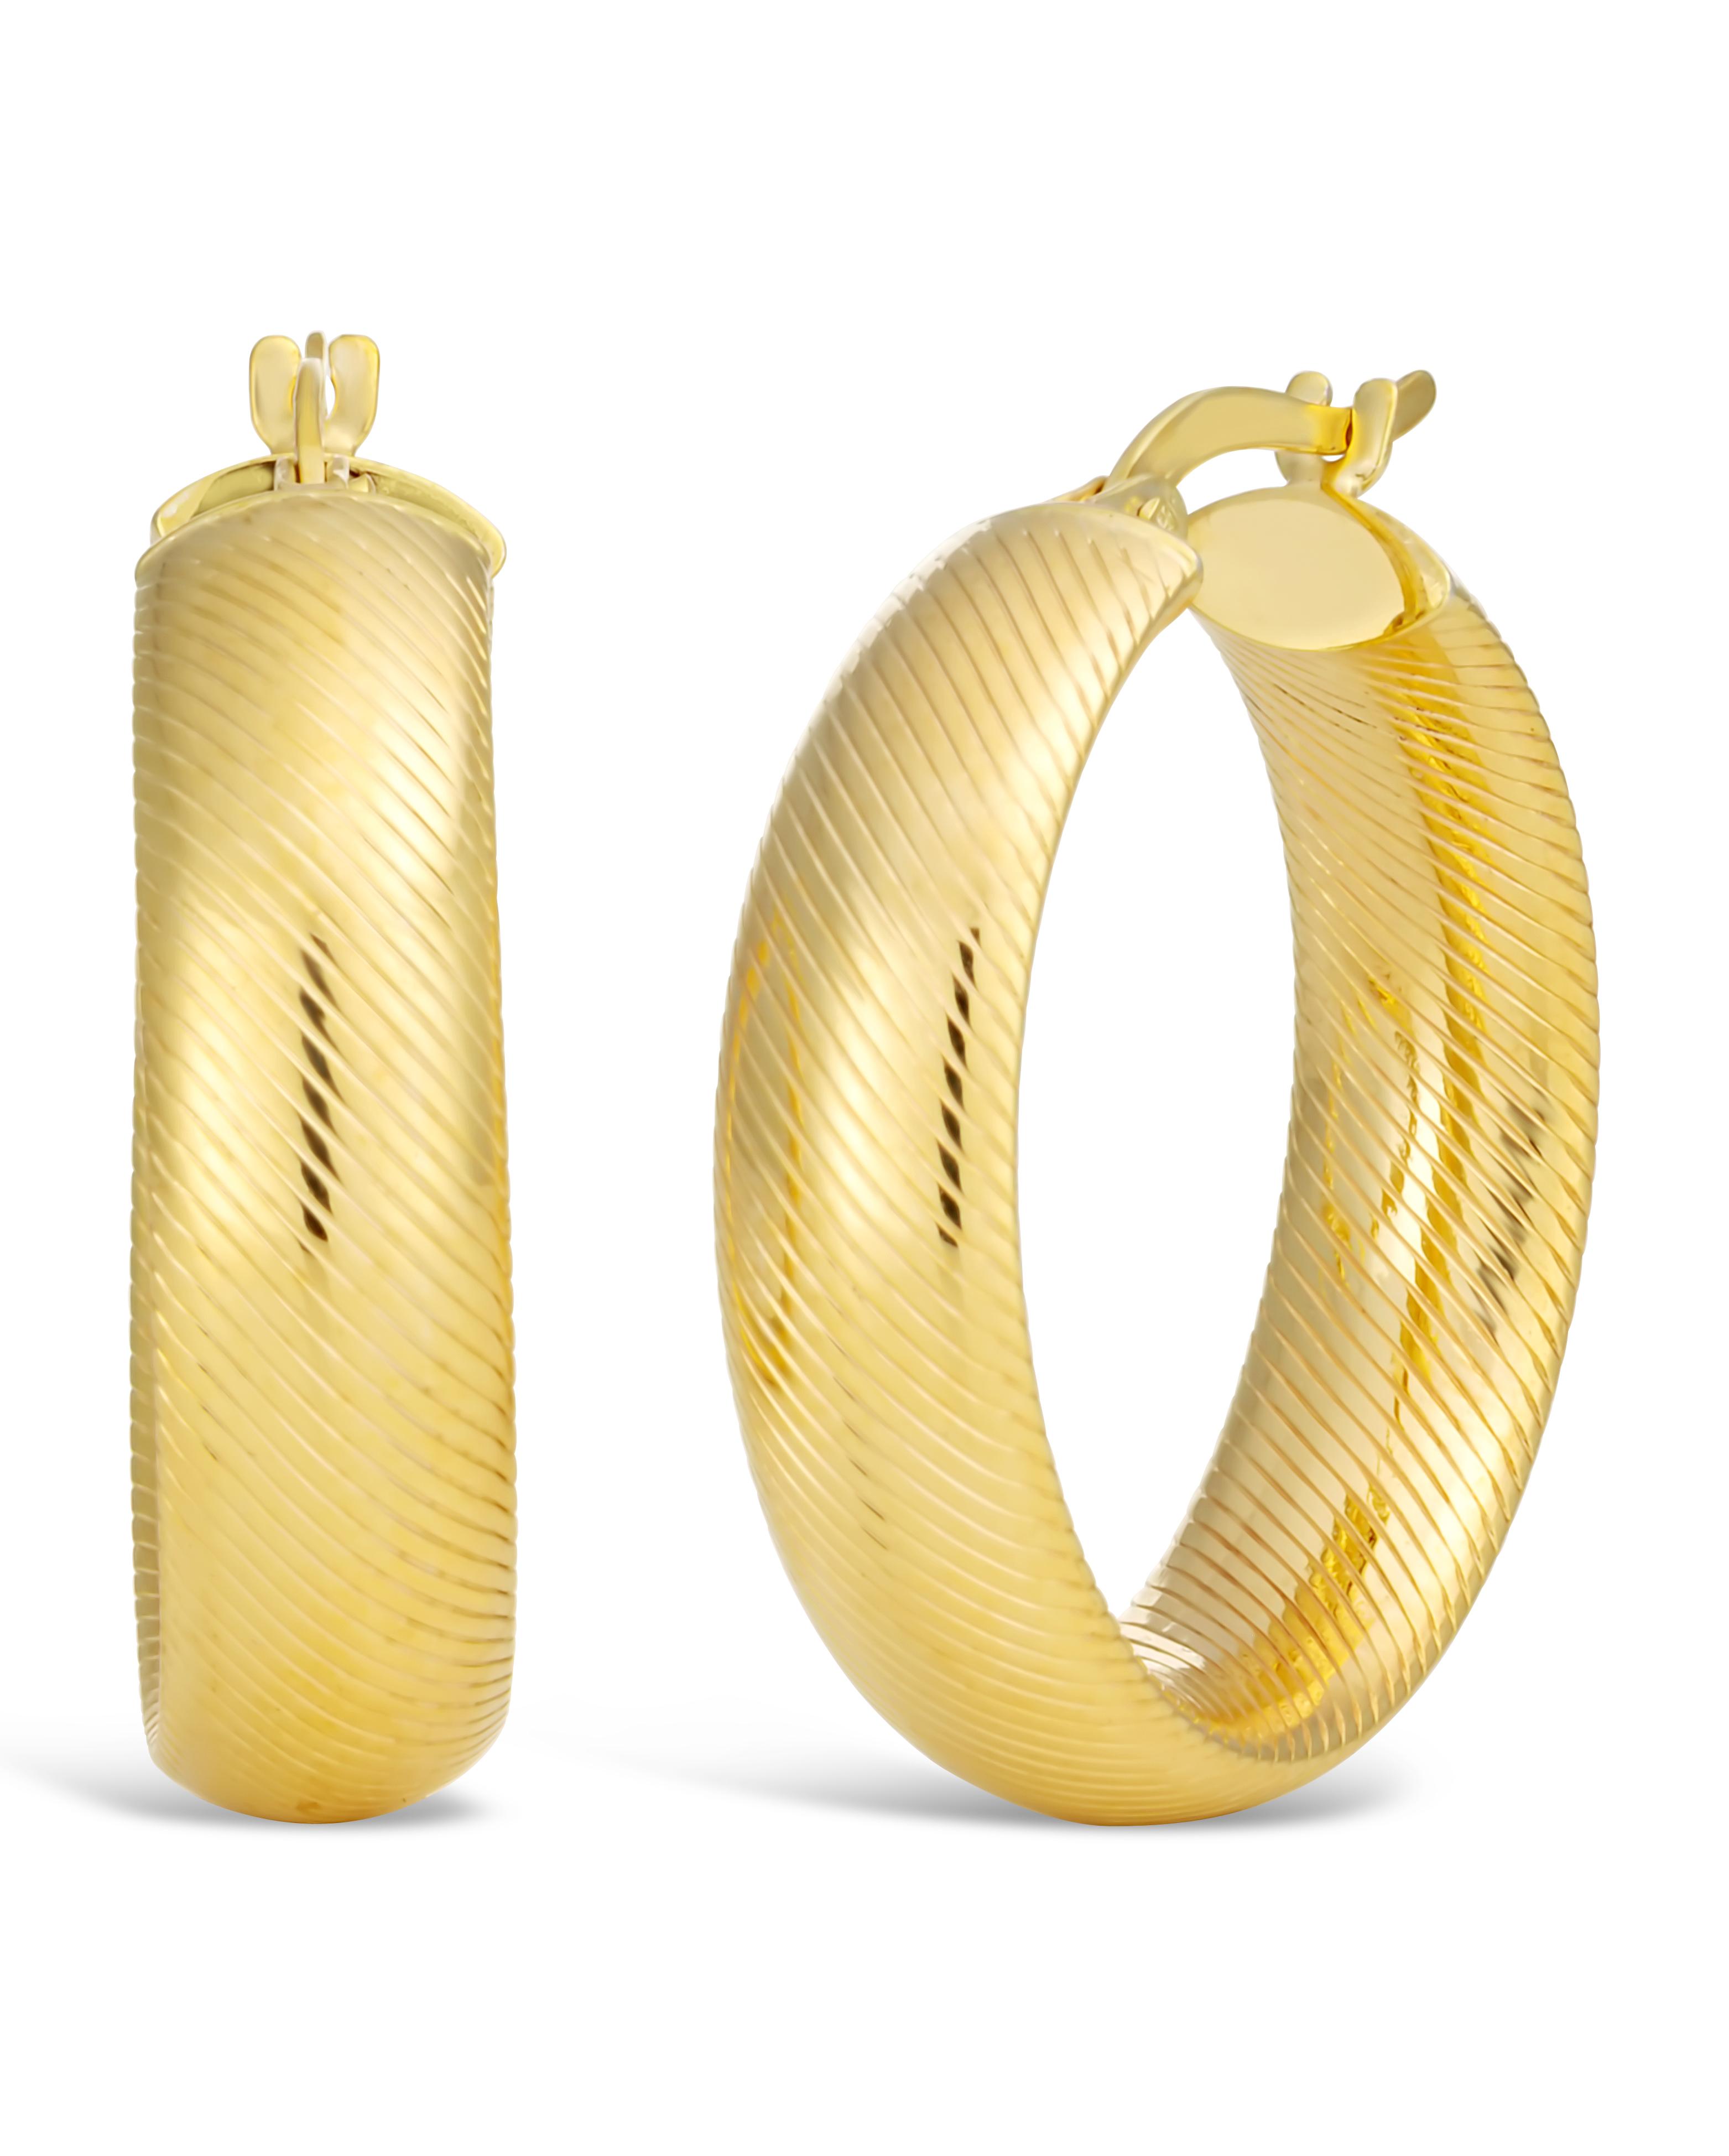 9ct Yellow Gold Filled Diamond Cut 20mm Hoop Earrings